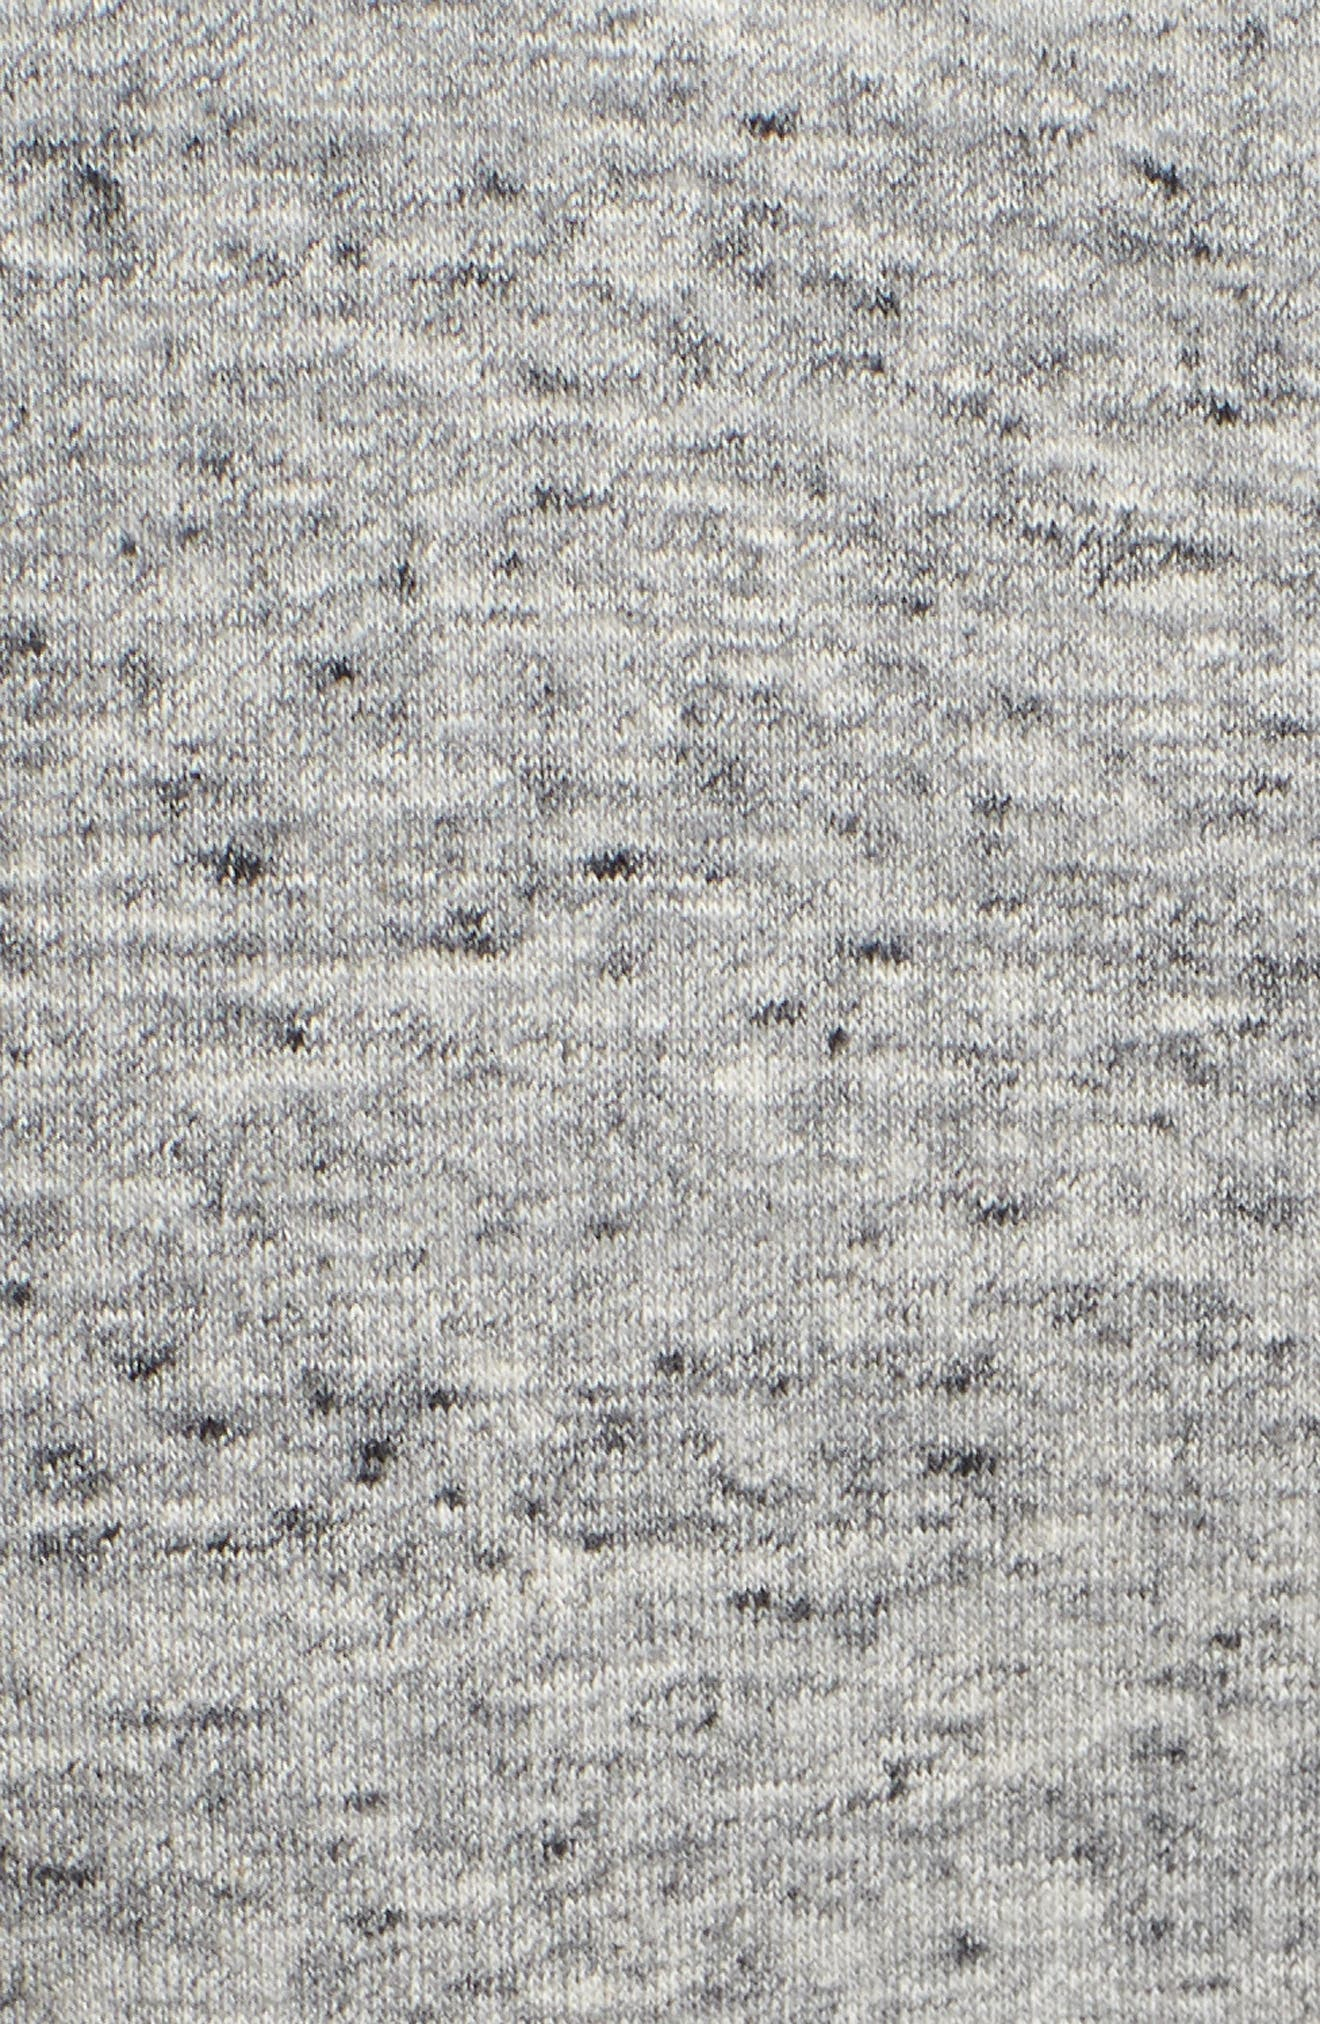 Velvet Tie A-Line Dress,                             Alternate thumbnail 7, color,                             020